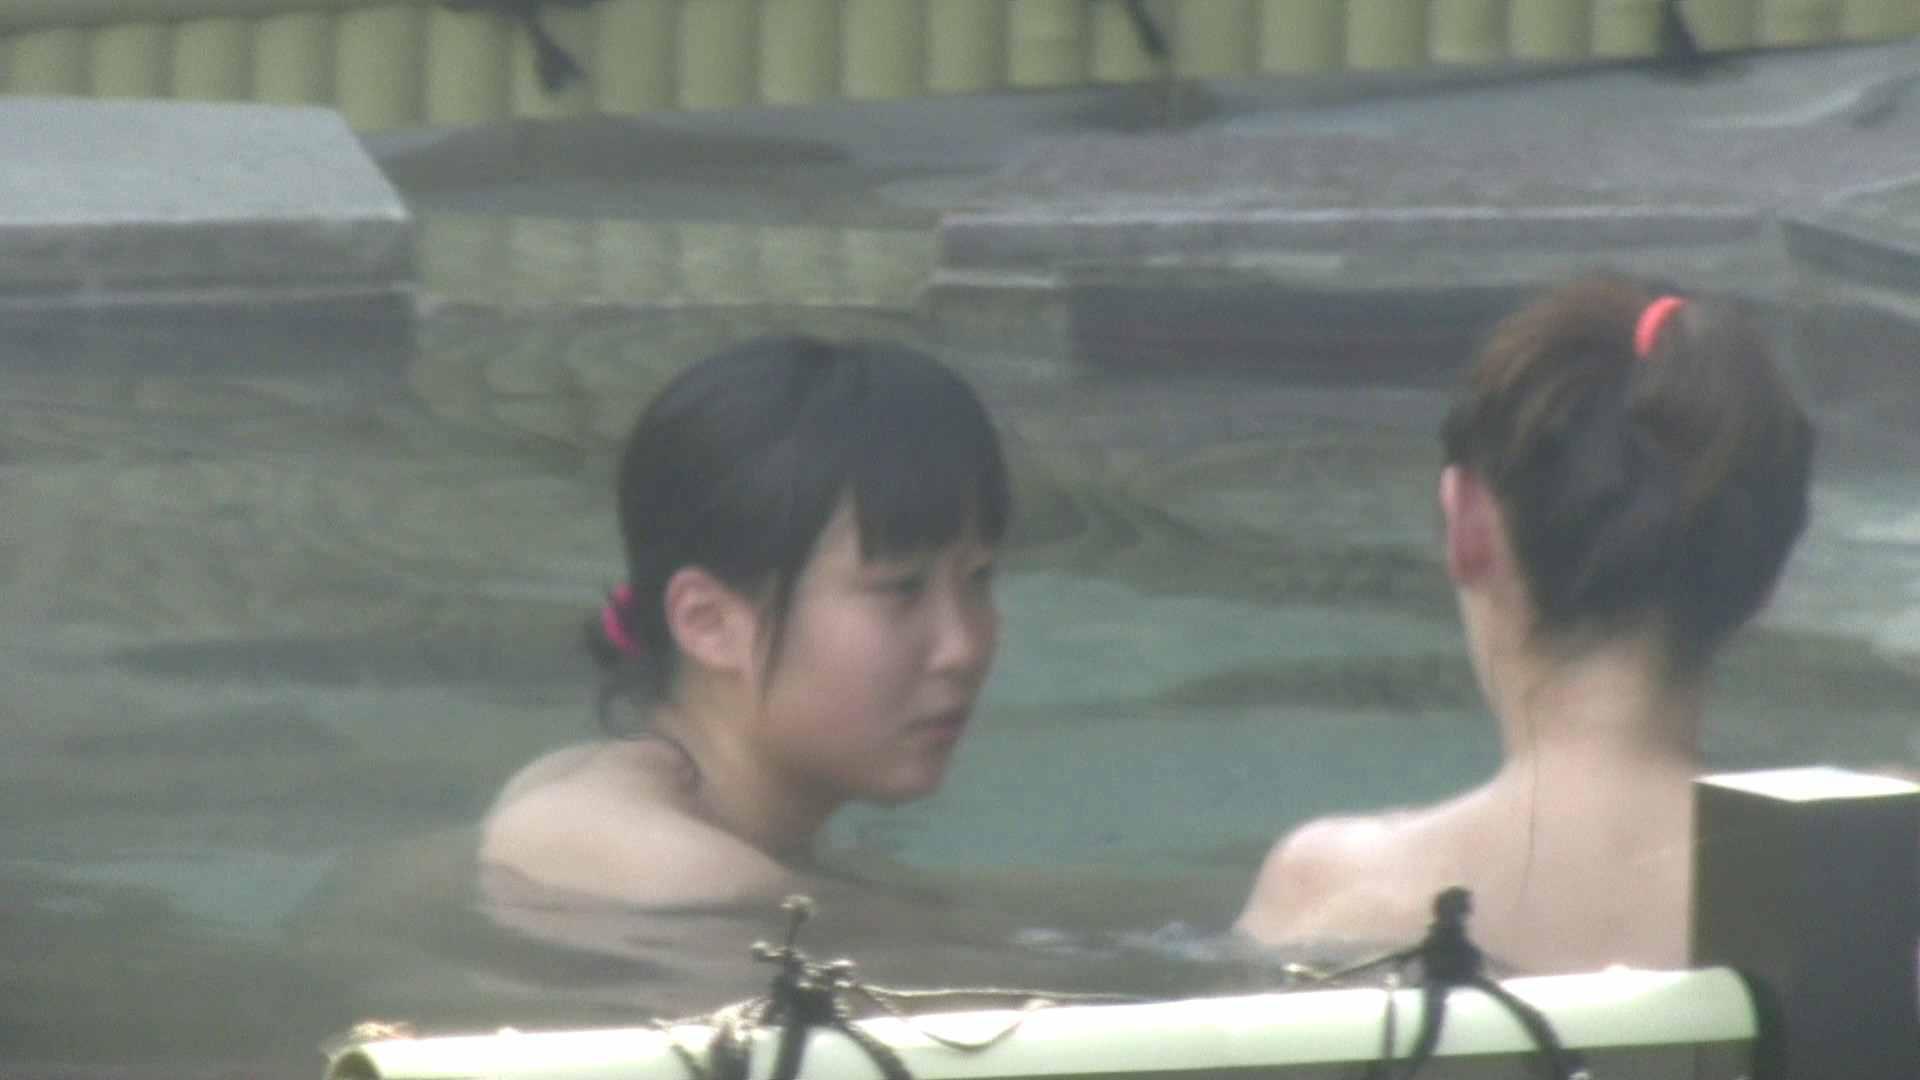 Aquaな露天風呂Vol.196 OLすけべ画像 性交動画流出 61連発 53